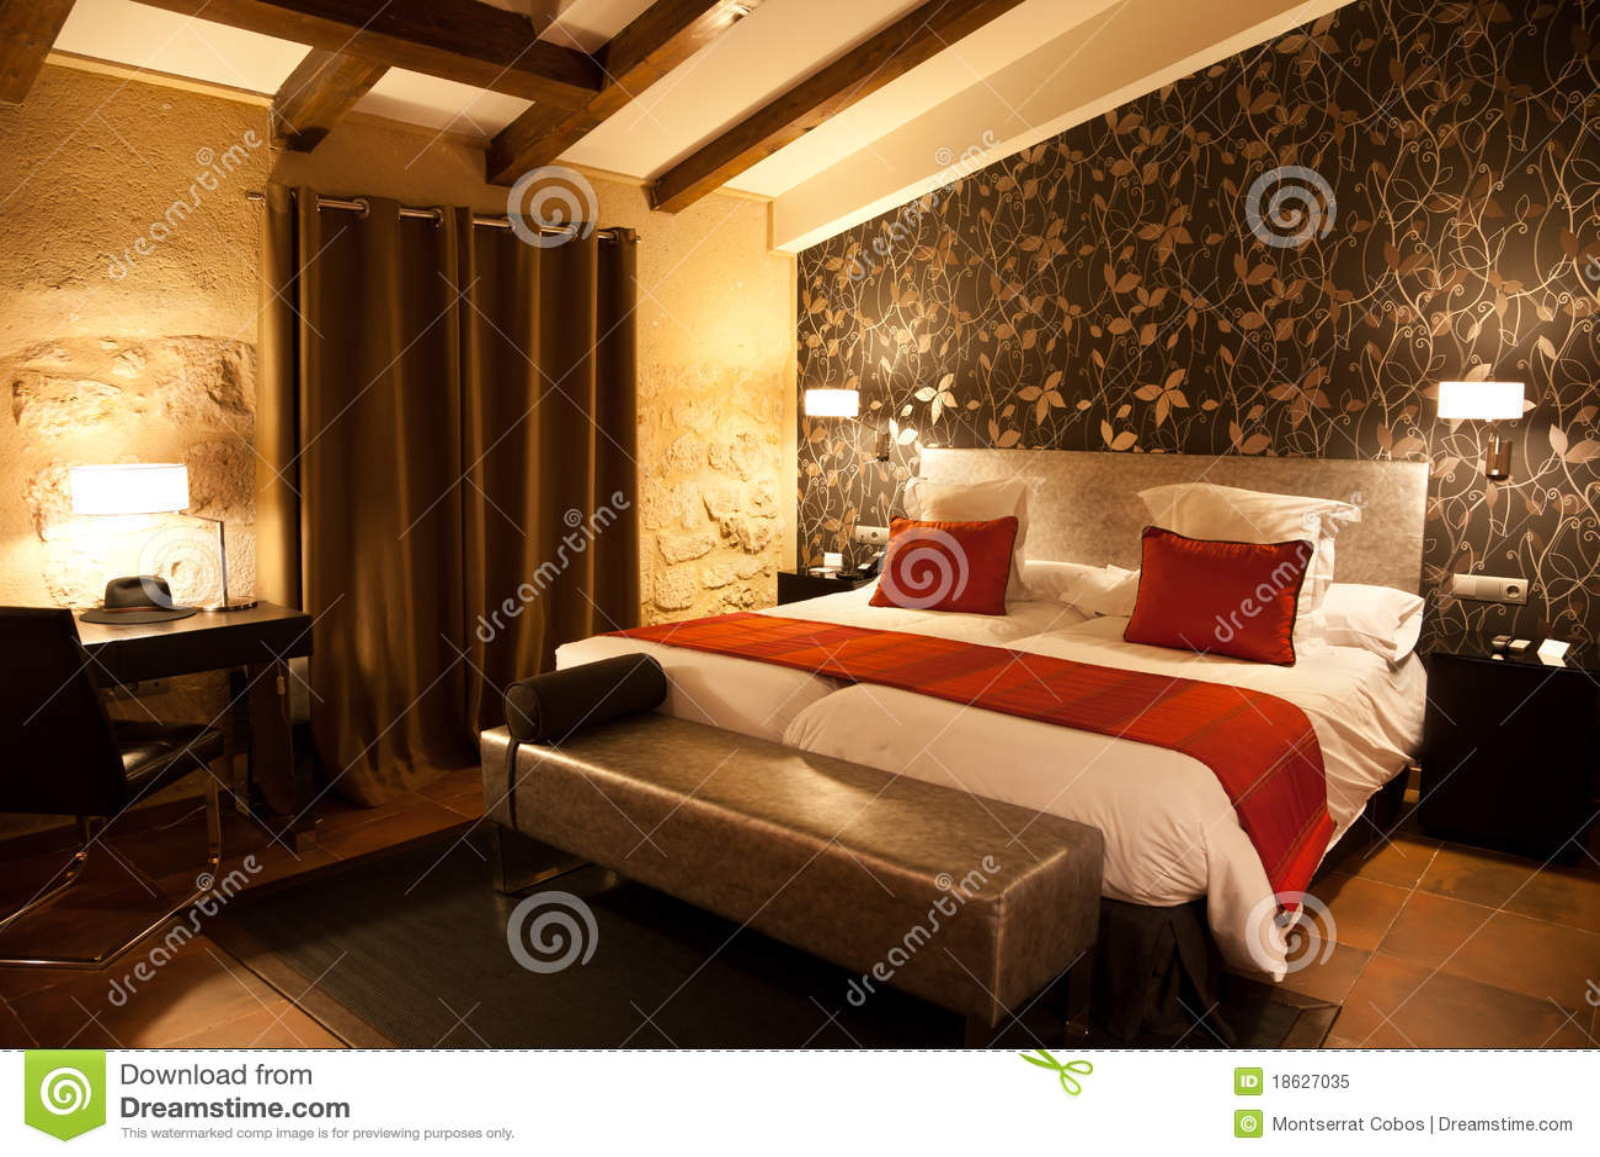 Camera Da Letto Rustica Moderna : Camera da letto rustica great camera da letto stile arte povera